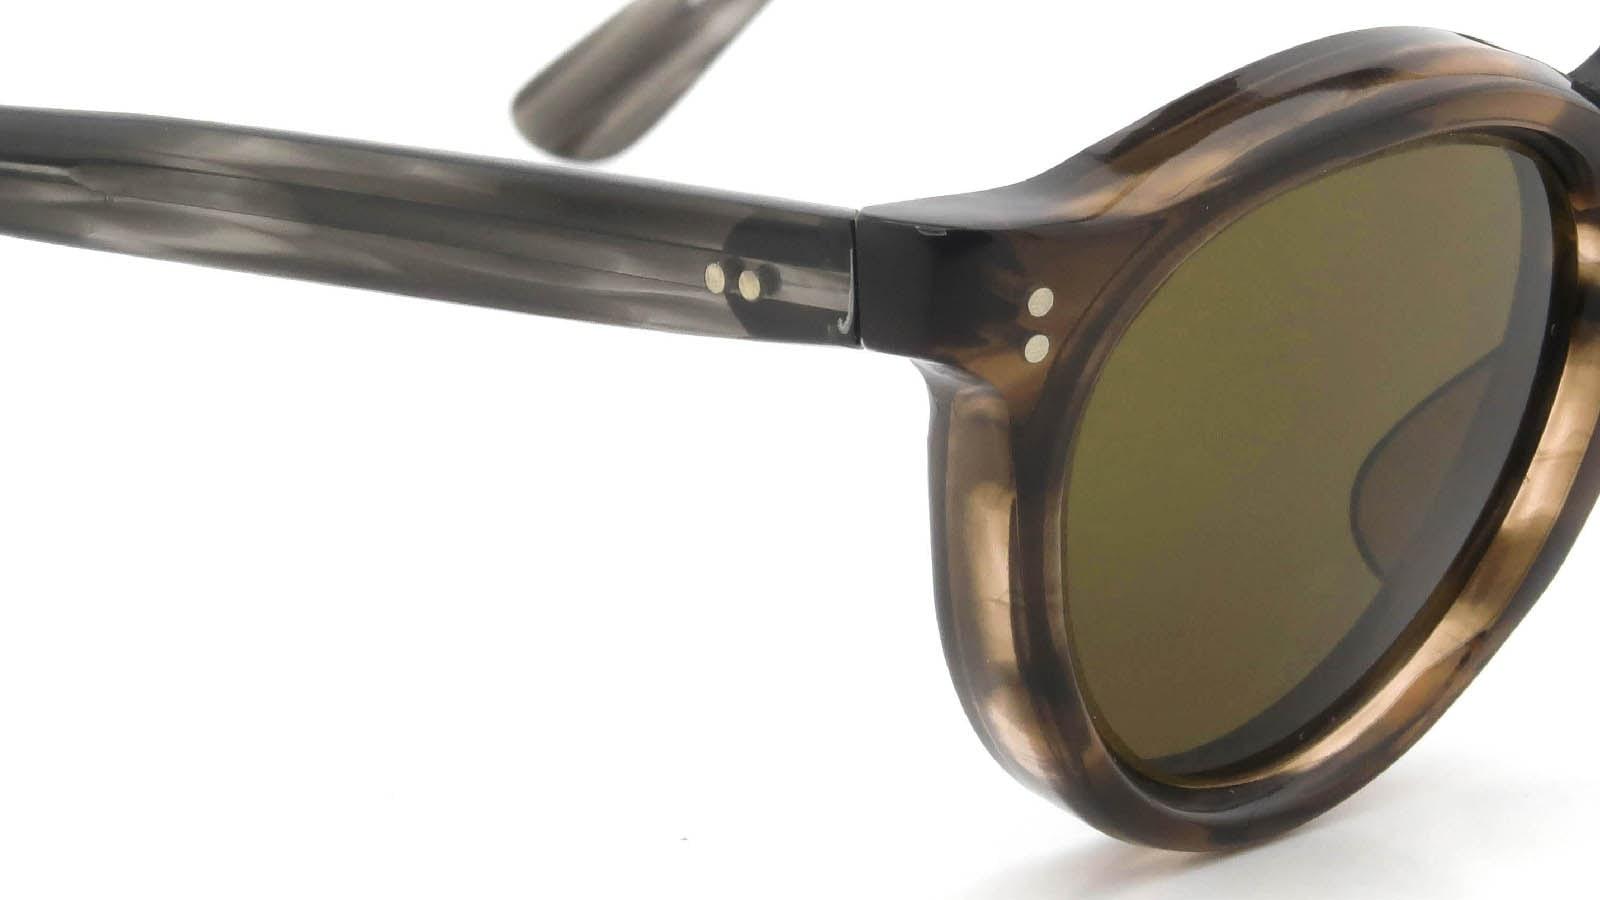 Lesca VINTAGE Panto Ash-Brown-sasa 8mm (v5) 5